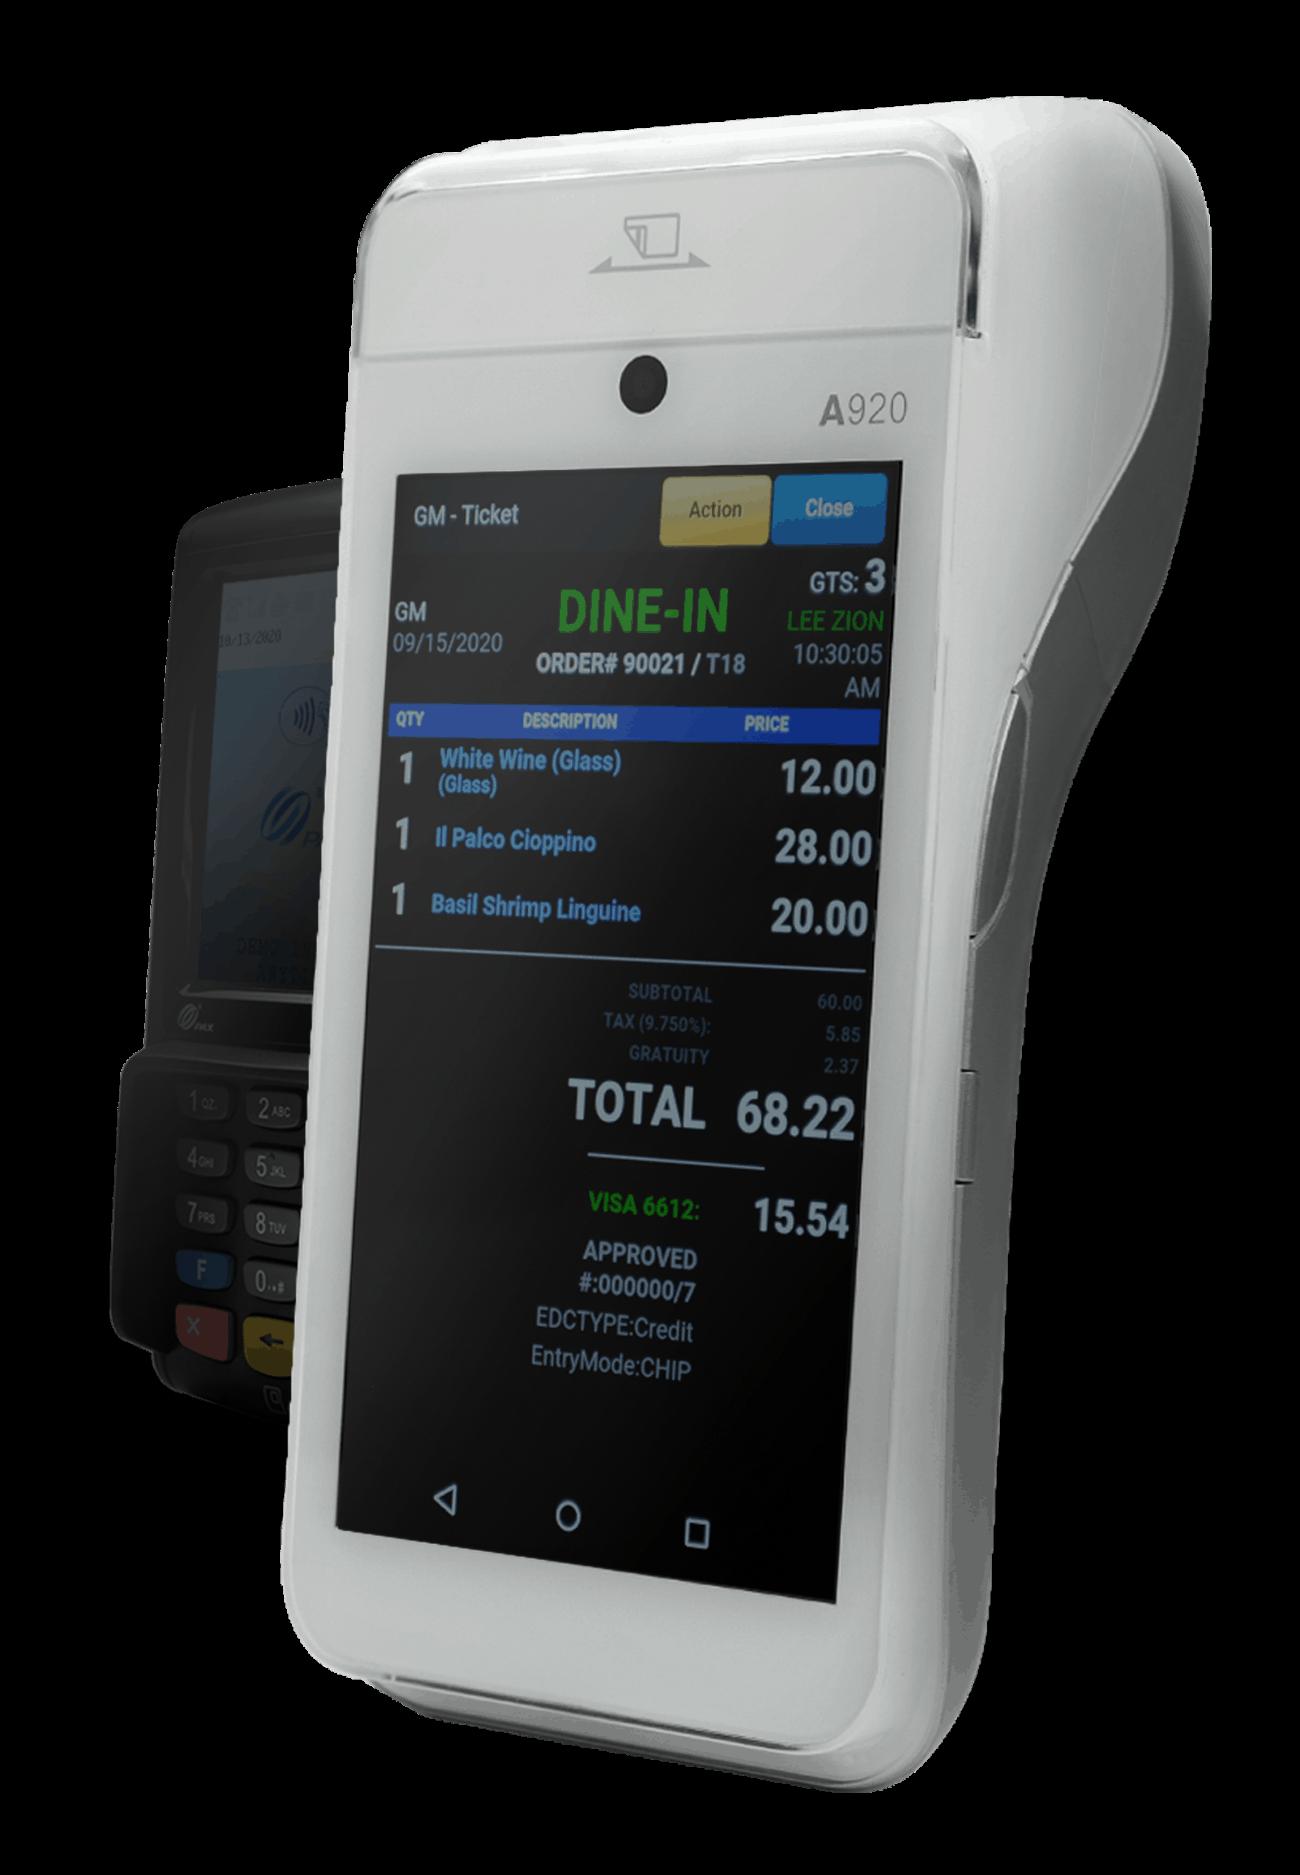 A920 mobile 2